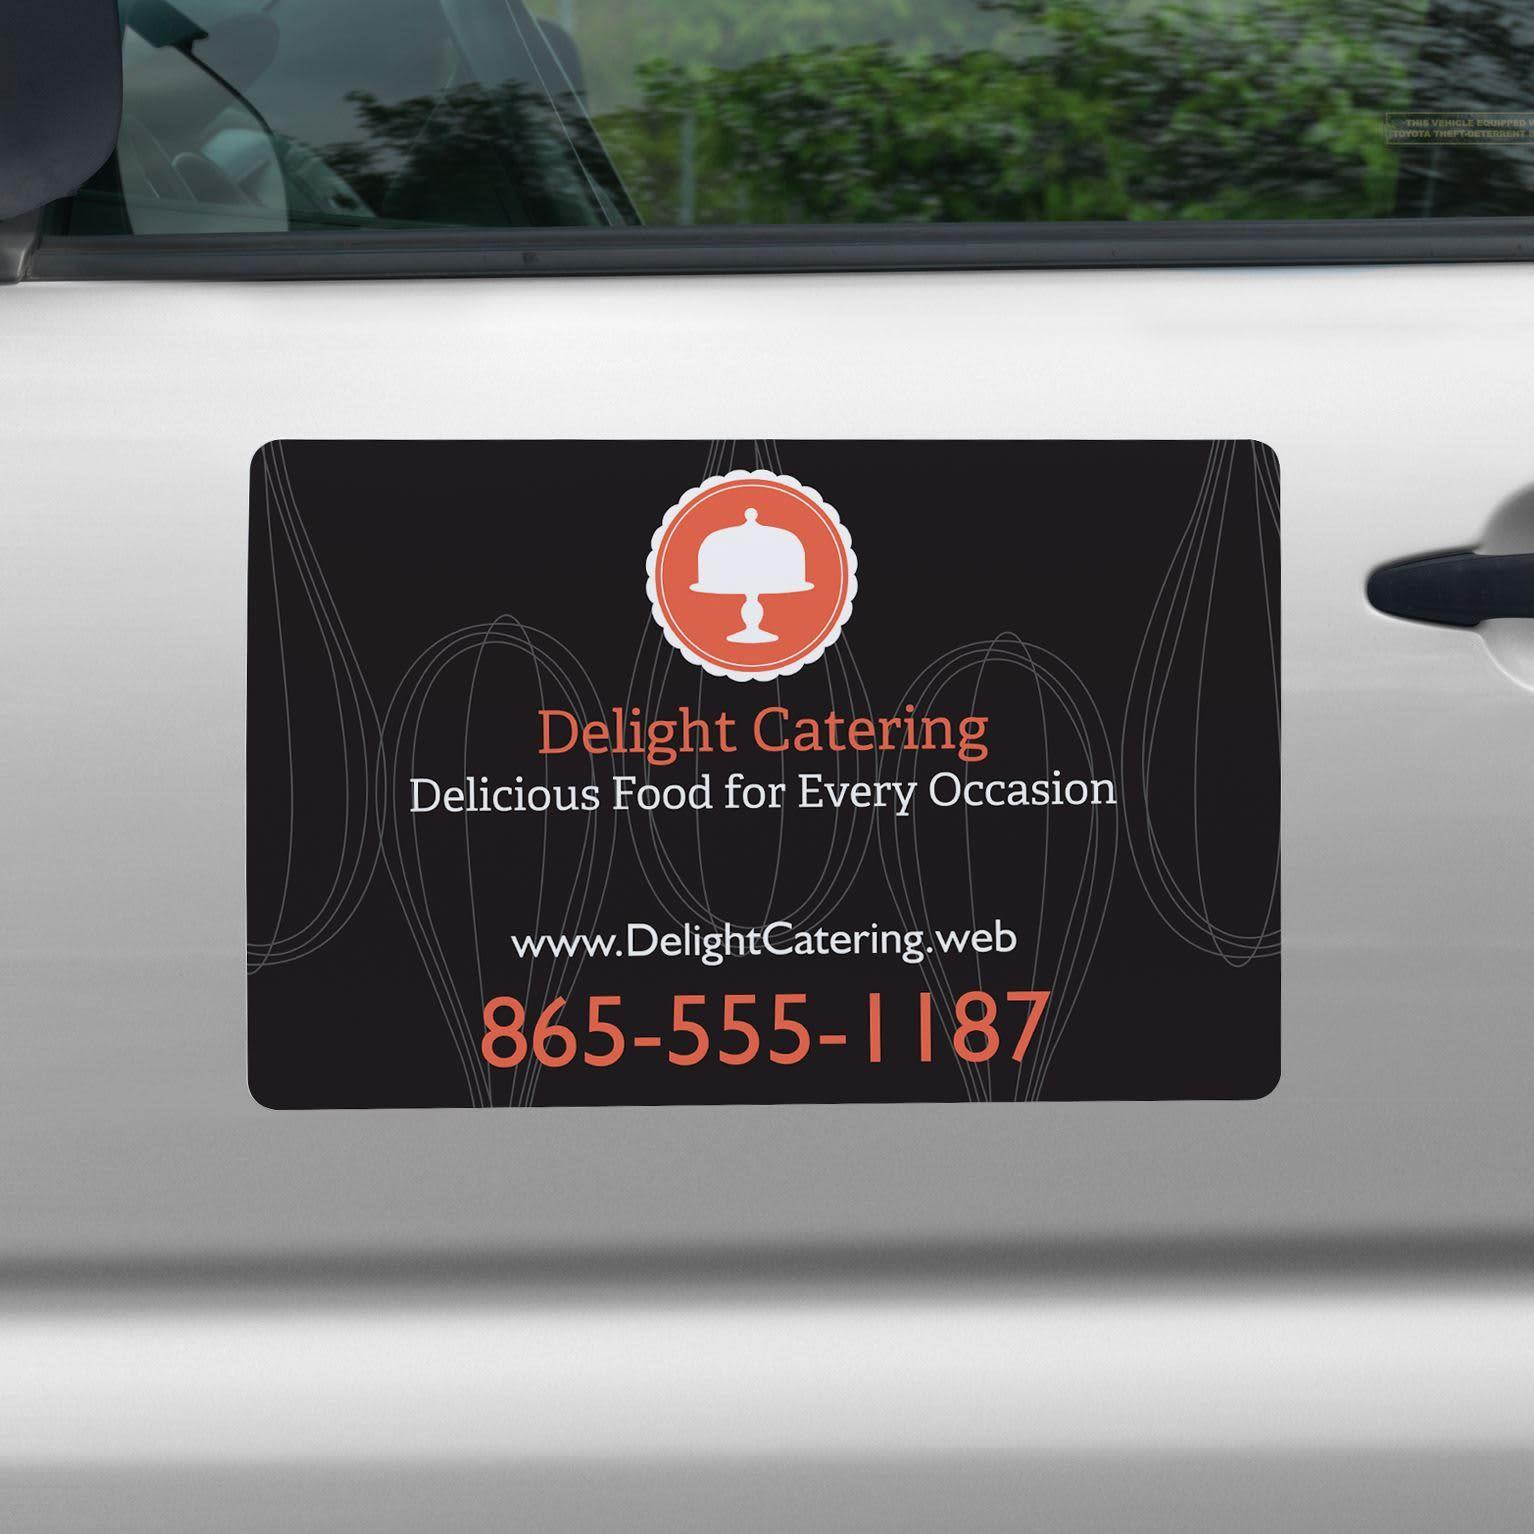 Car Magnets Magnetic Signs Vistaprint Car Magnets Vehicle Magnets Custom Signage [ 1534 x 1534 Pixel ]